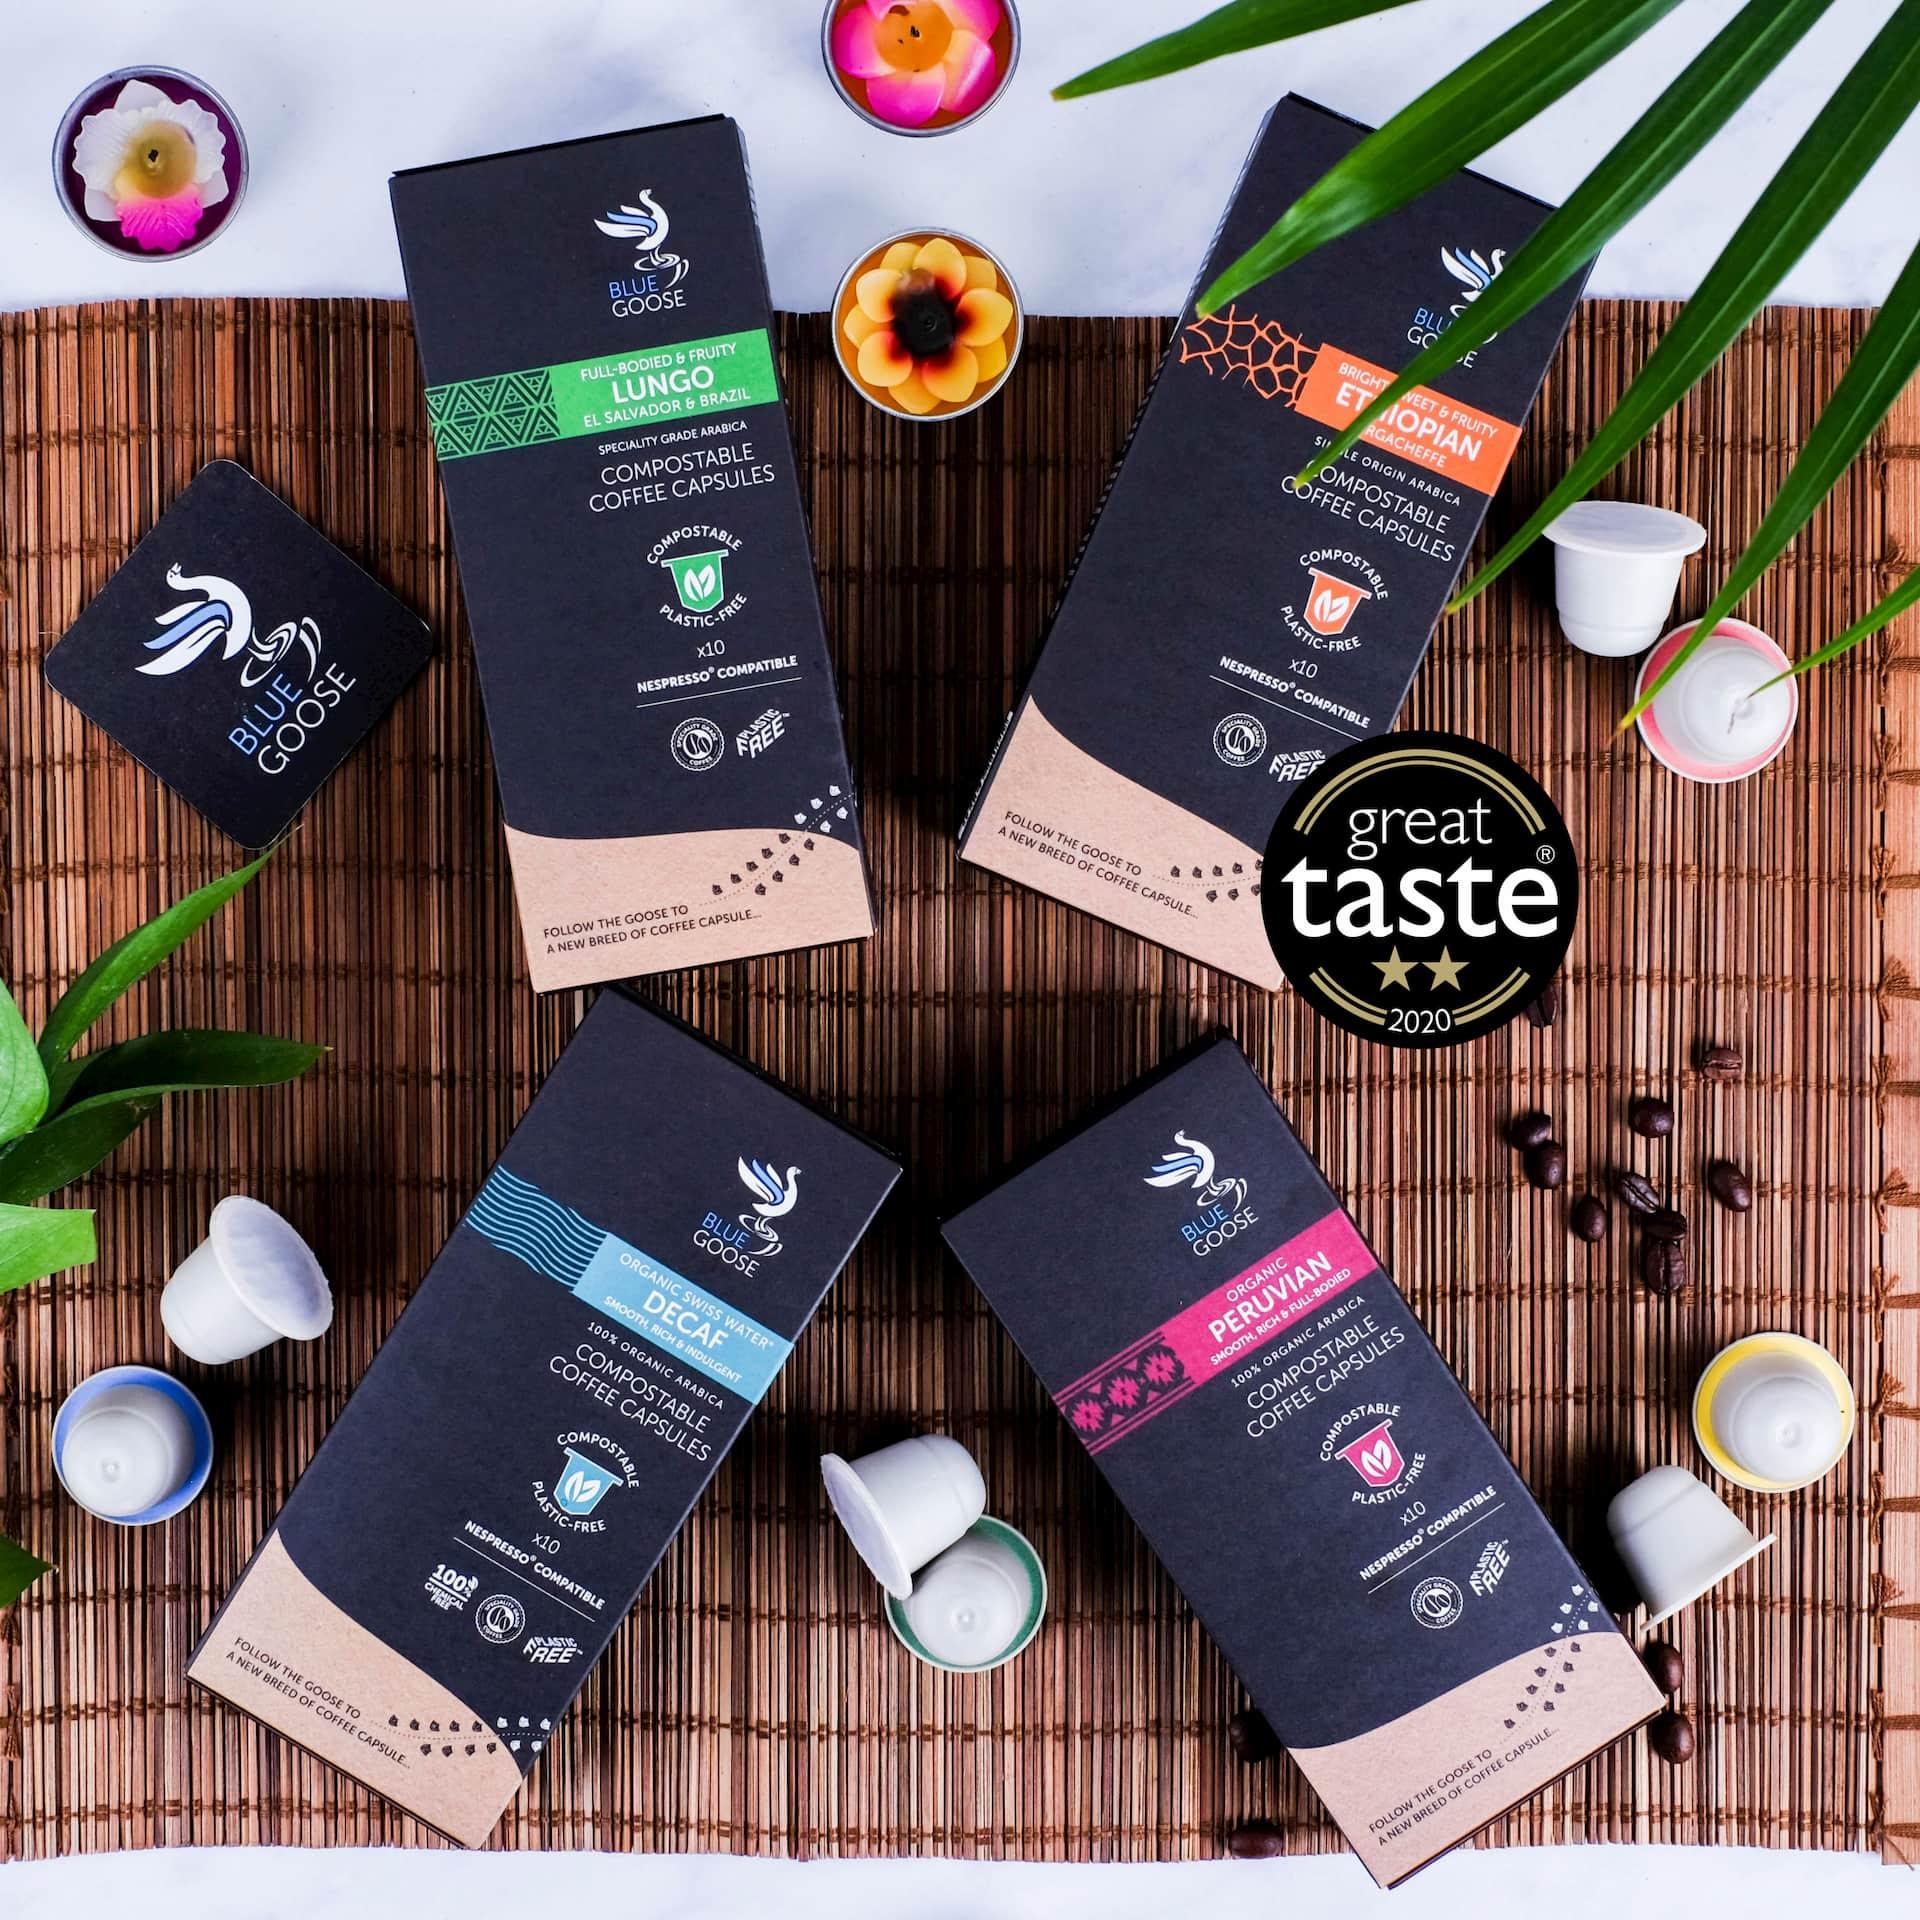 Biodegradable Compostable Nespresso Coffee Pods Blue Goose Plastic Free Eco Coffee Capsules